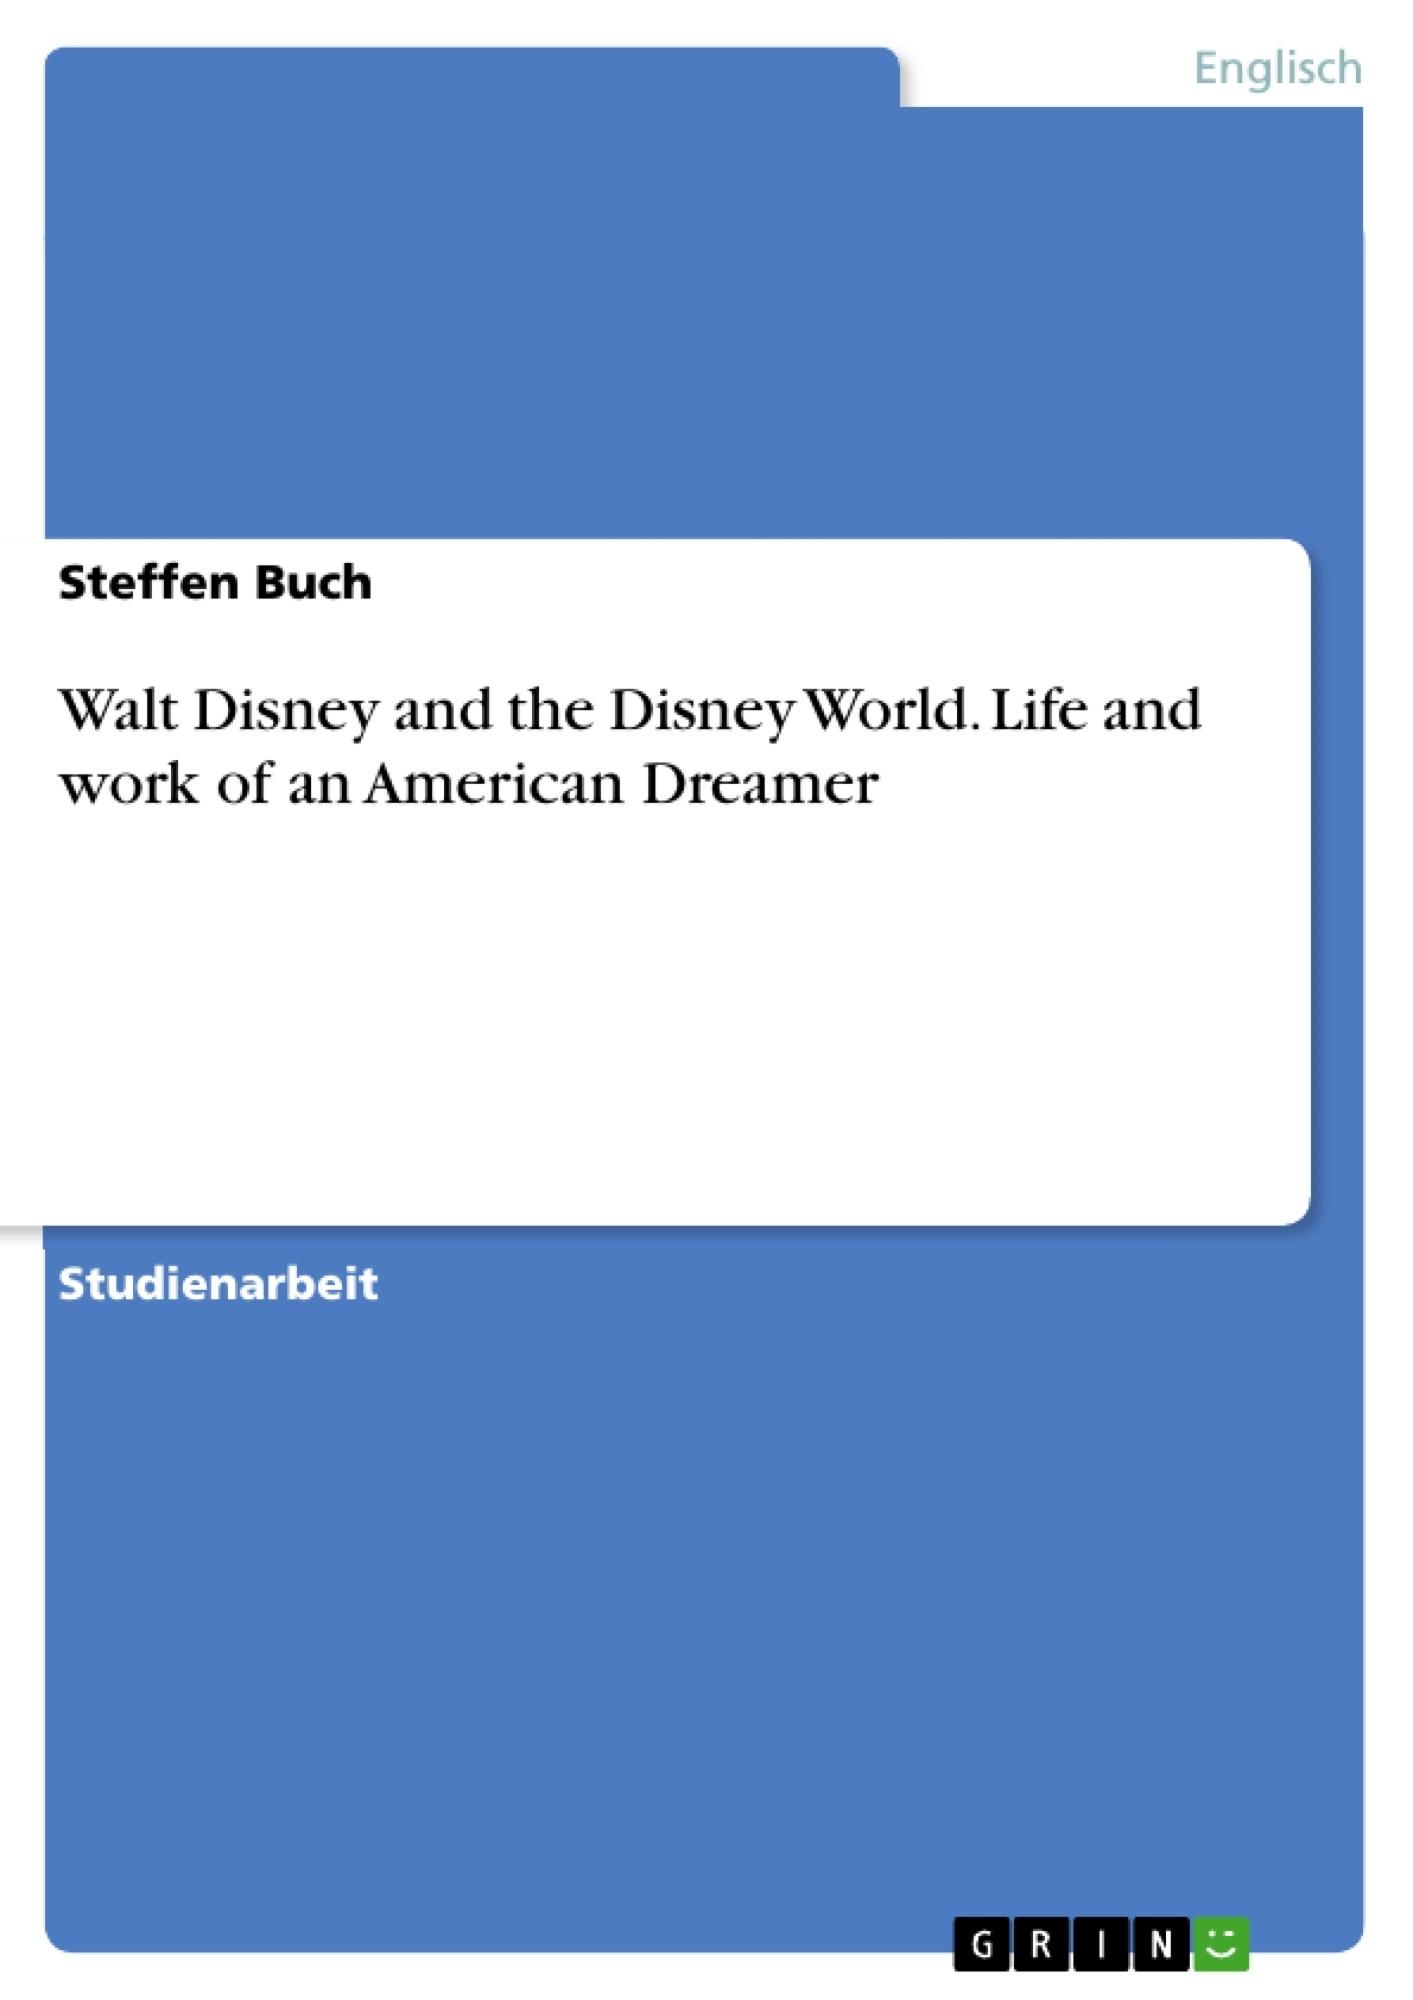 Titel: Walt Disney and the Disney World. Life and work of an American Dreamer